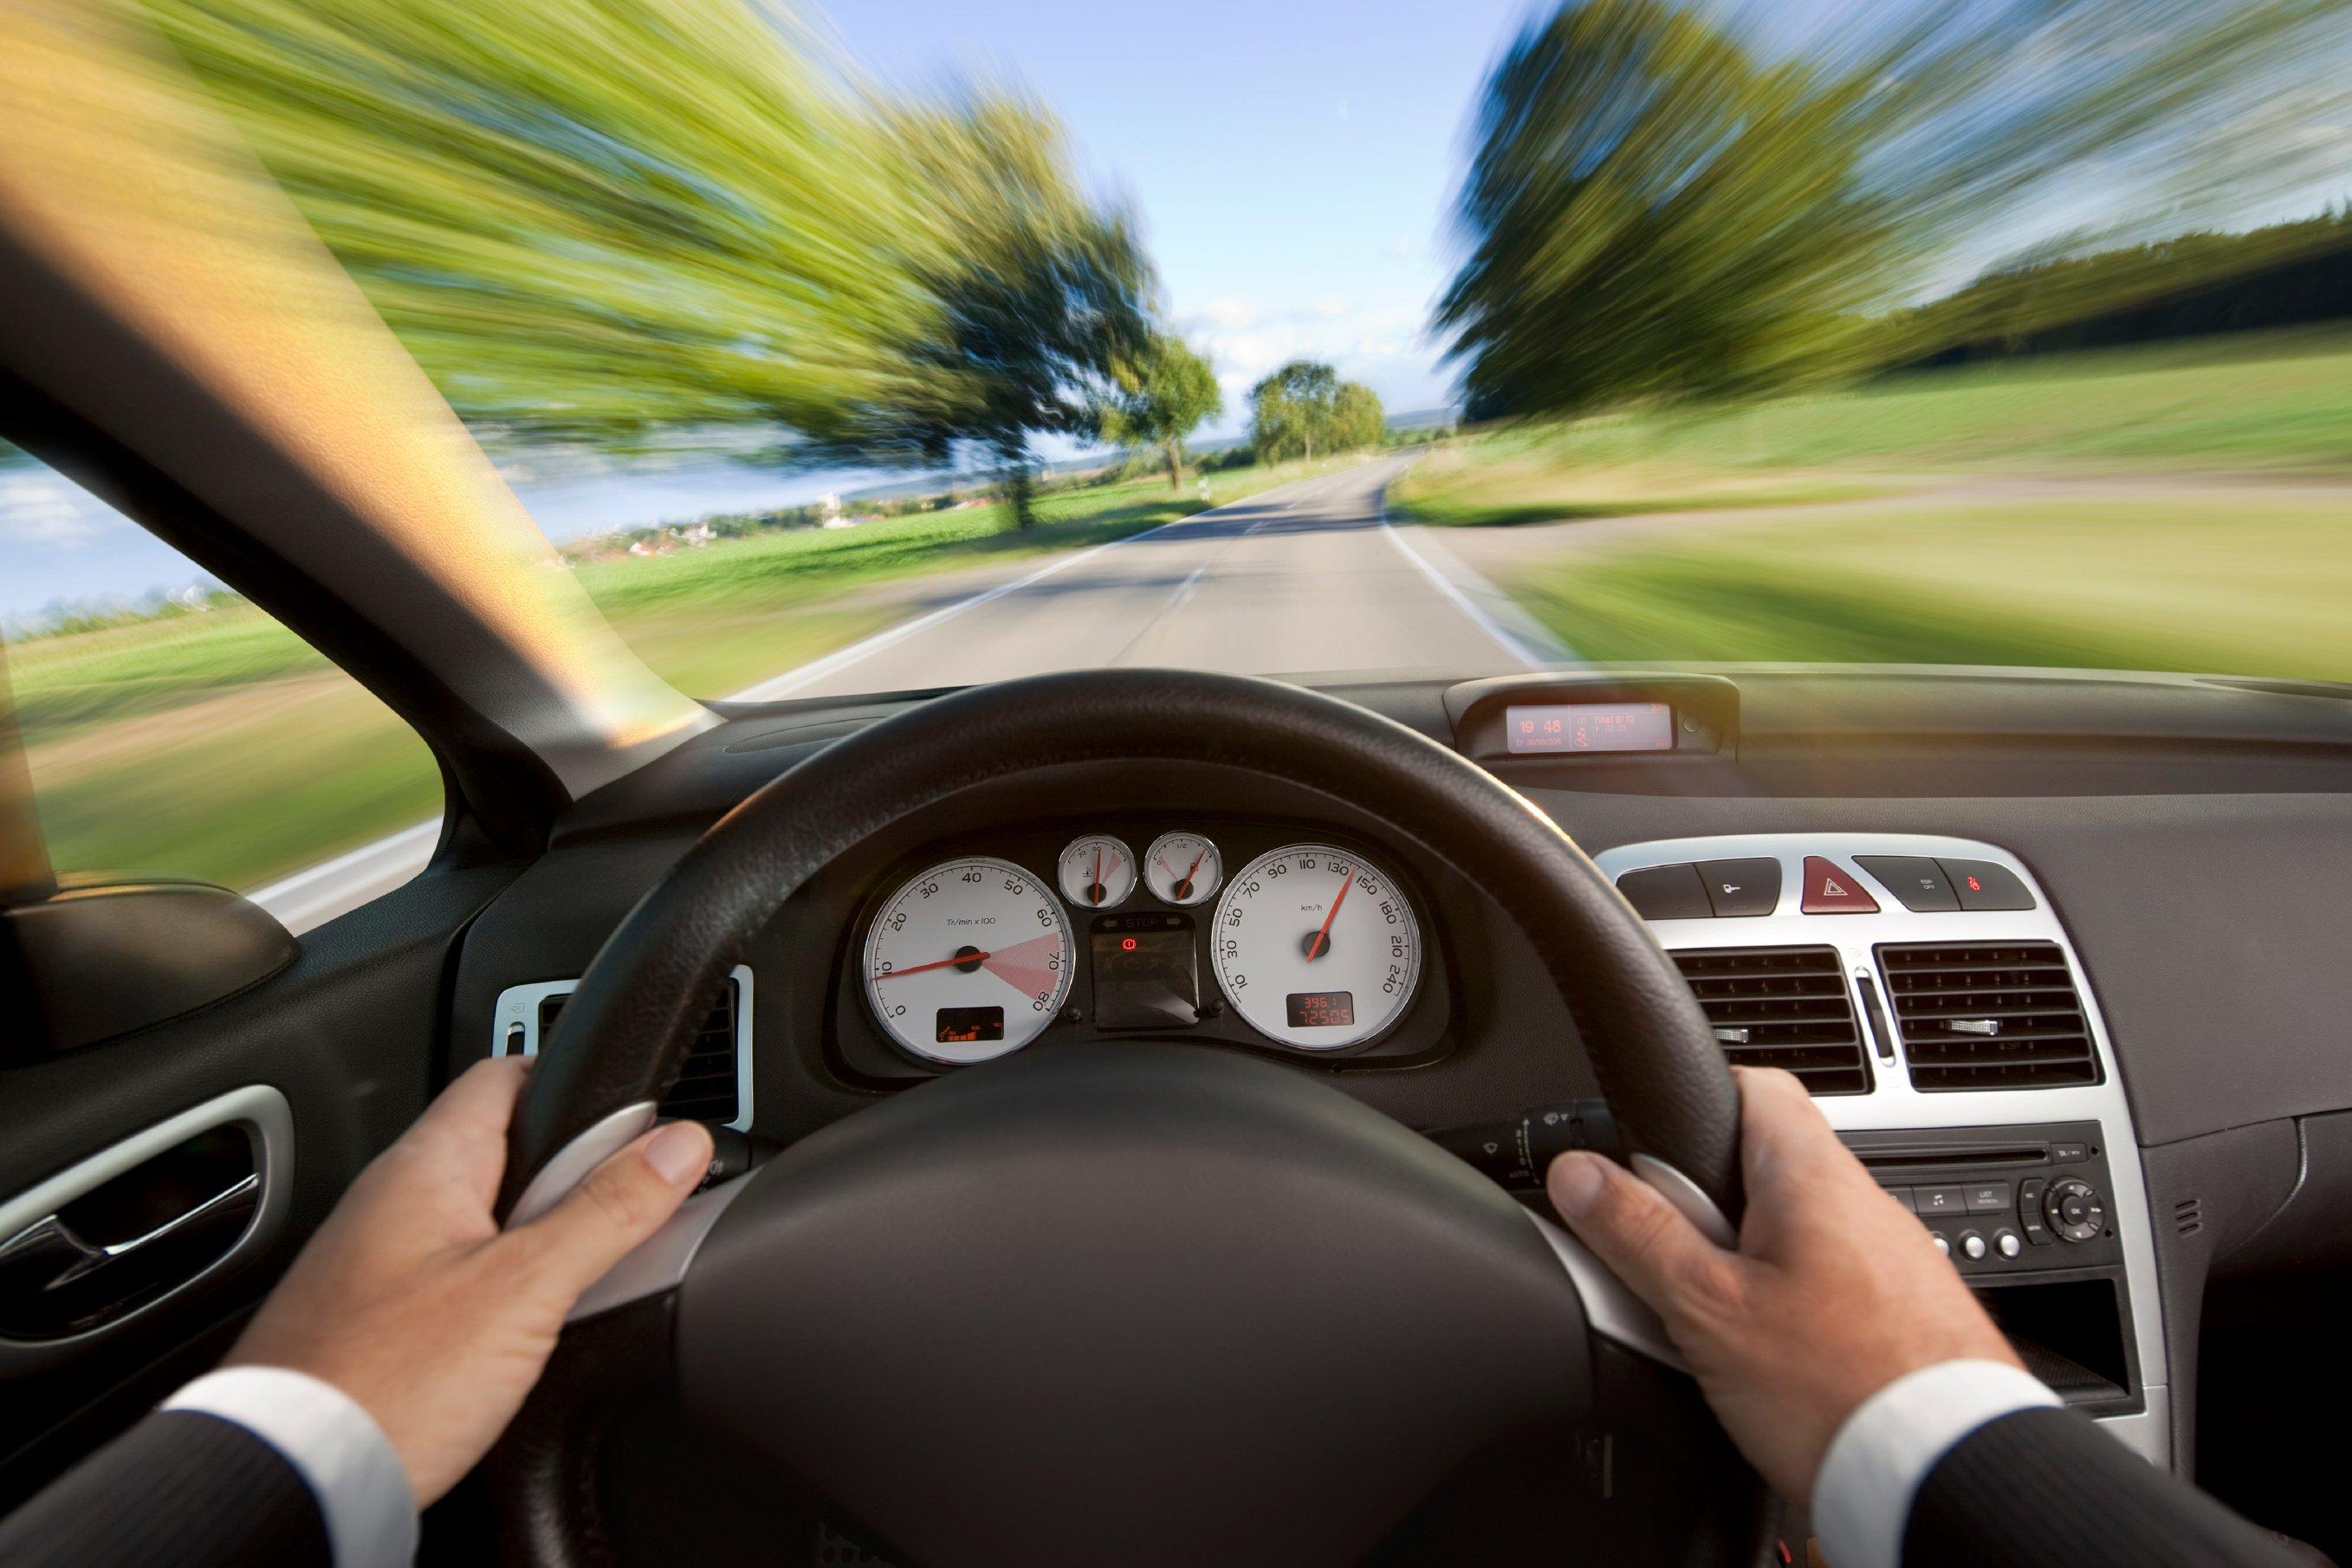 discretionary speeding cvc 22407 california traffic tickets. Black Bedroom Furniture Sets. Home Design Ideas